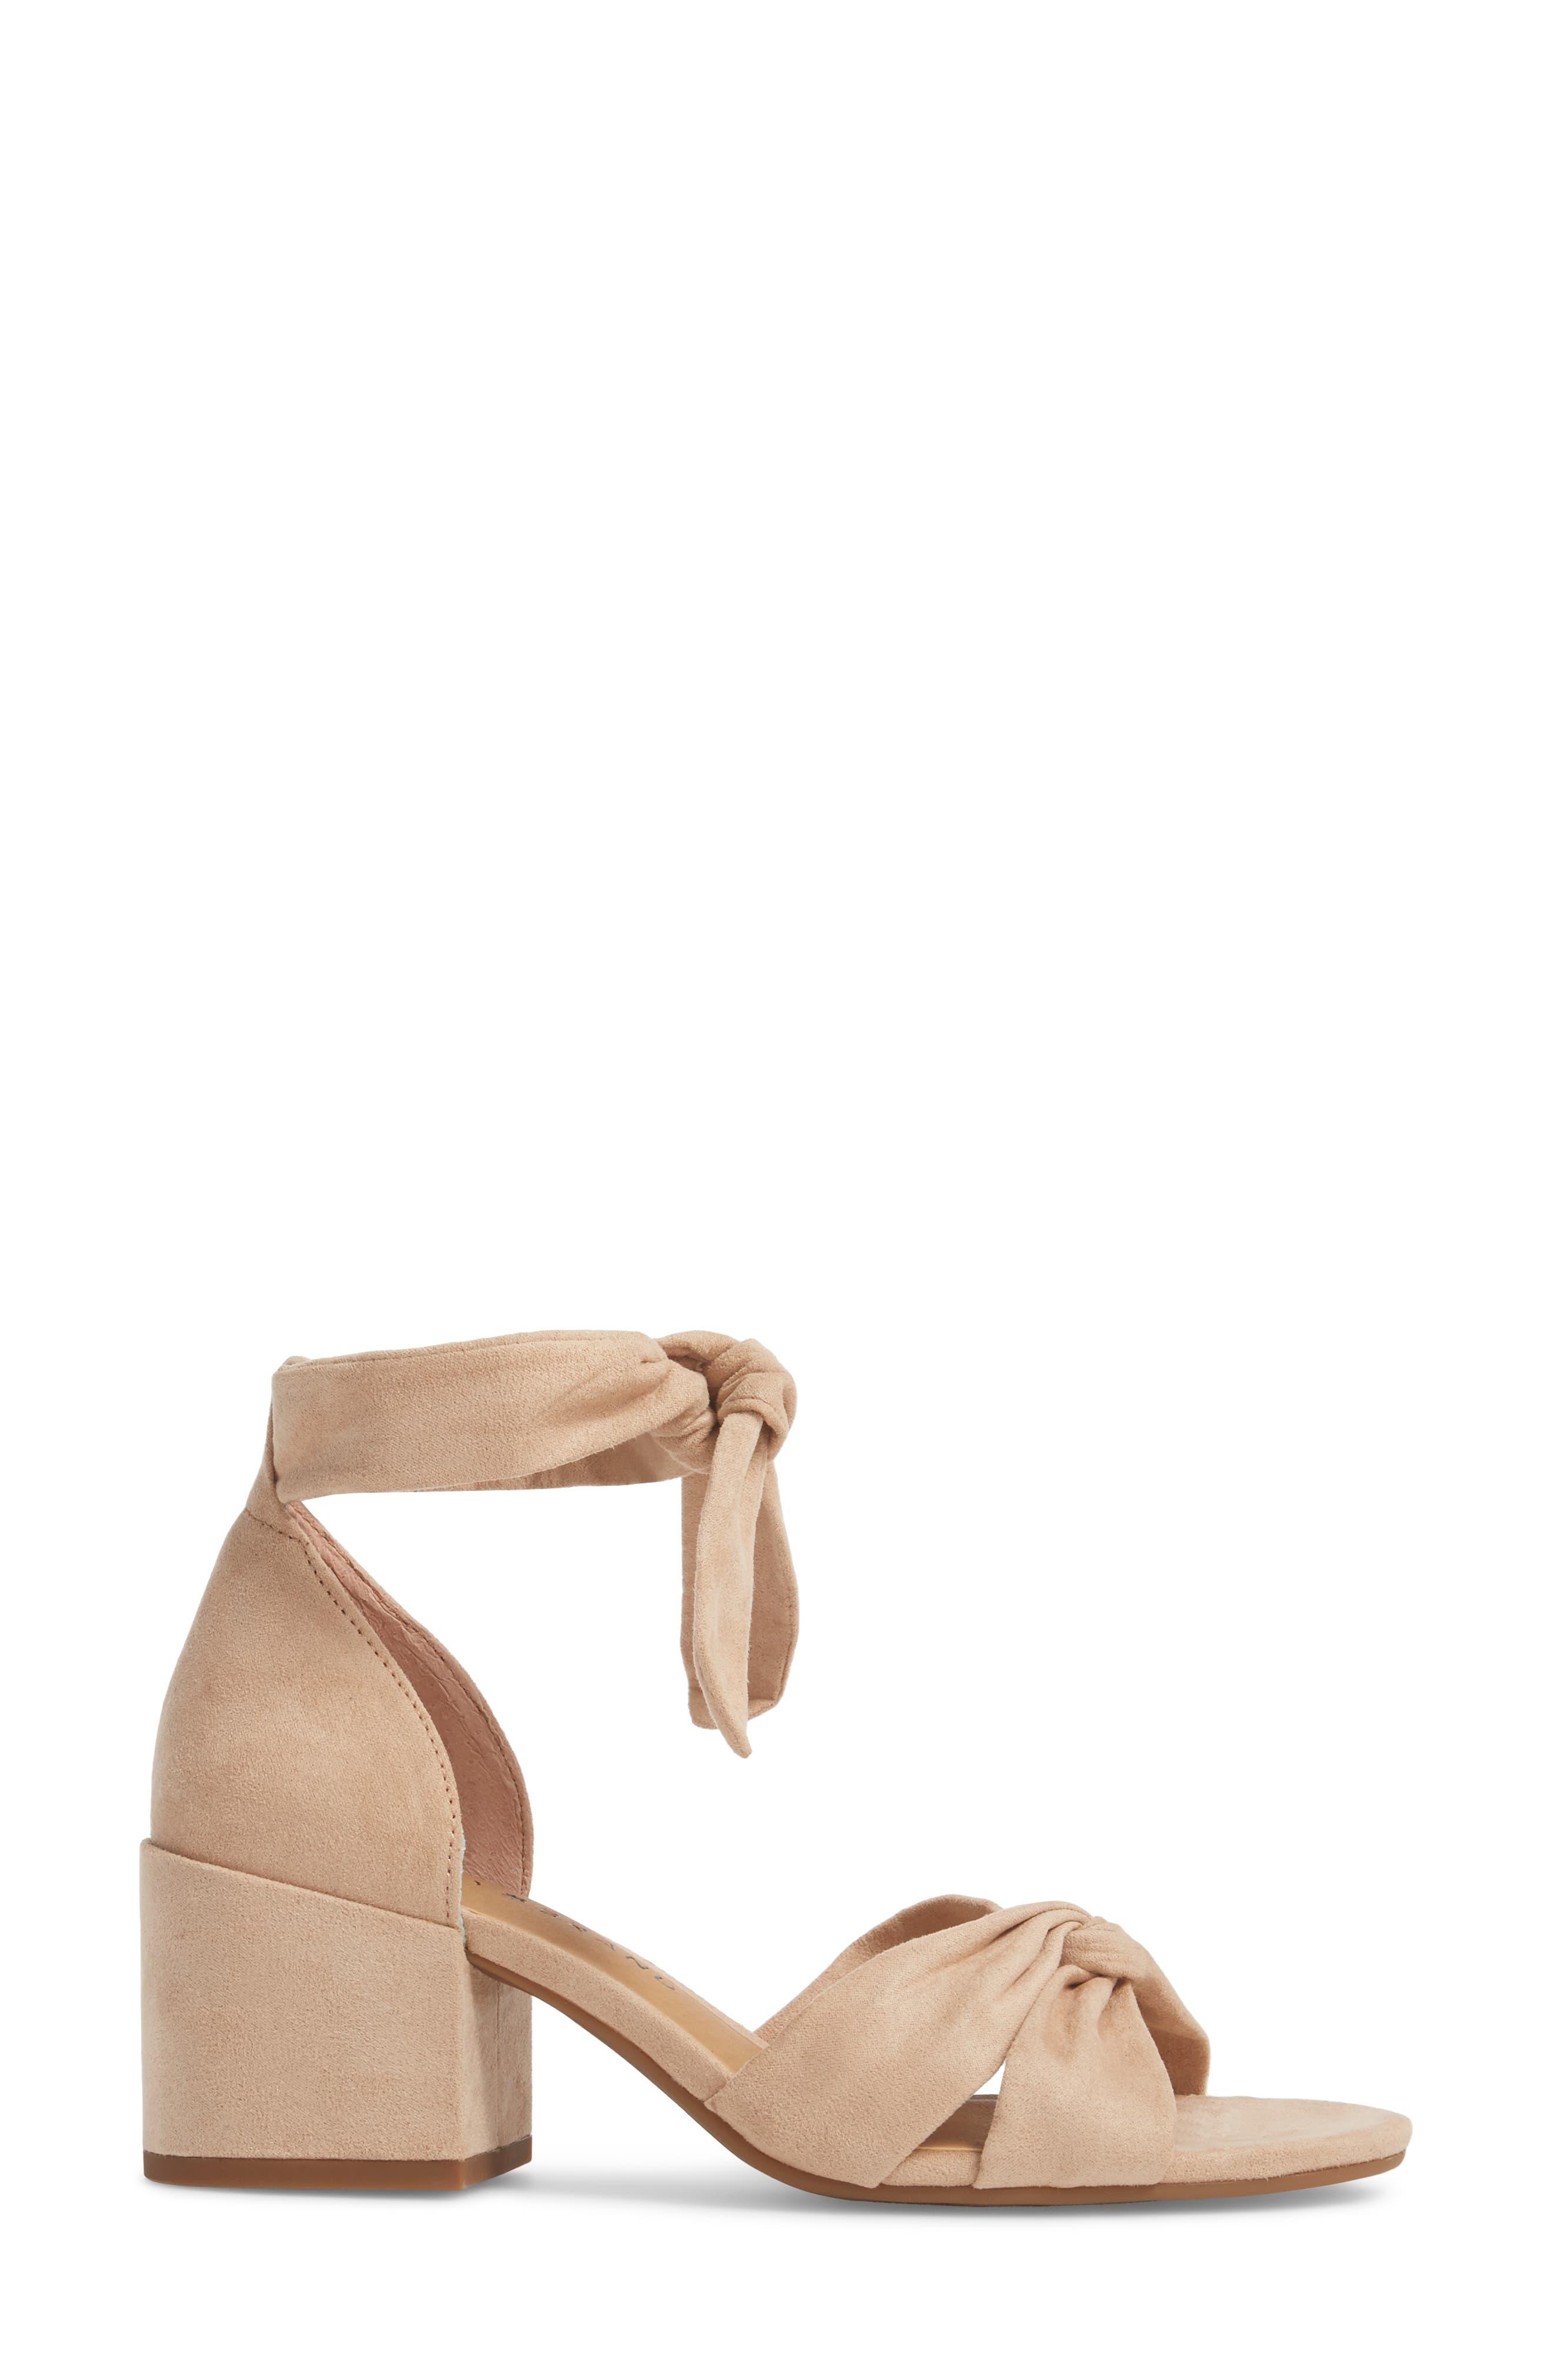 Xaylah Ankle Strap Sandal,                             Alternate thumbnail 19, color,